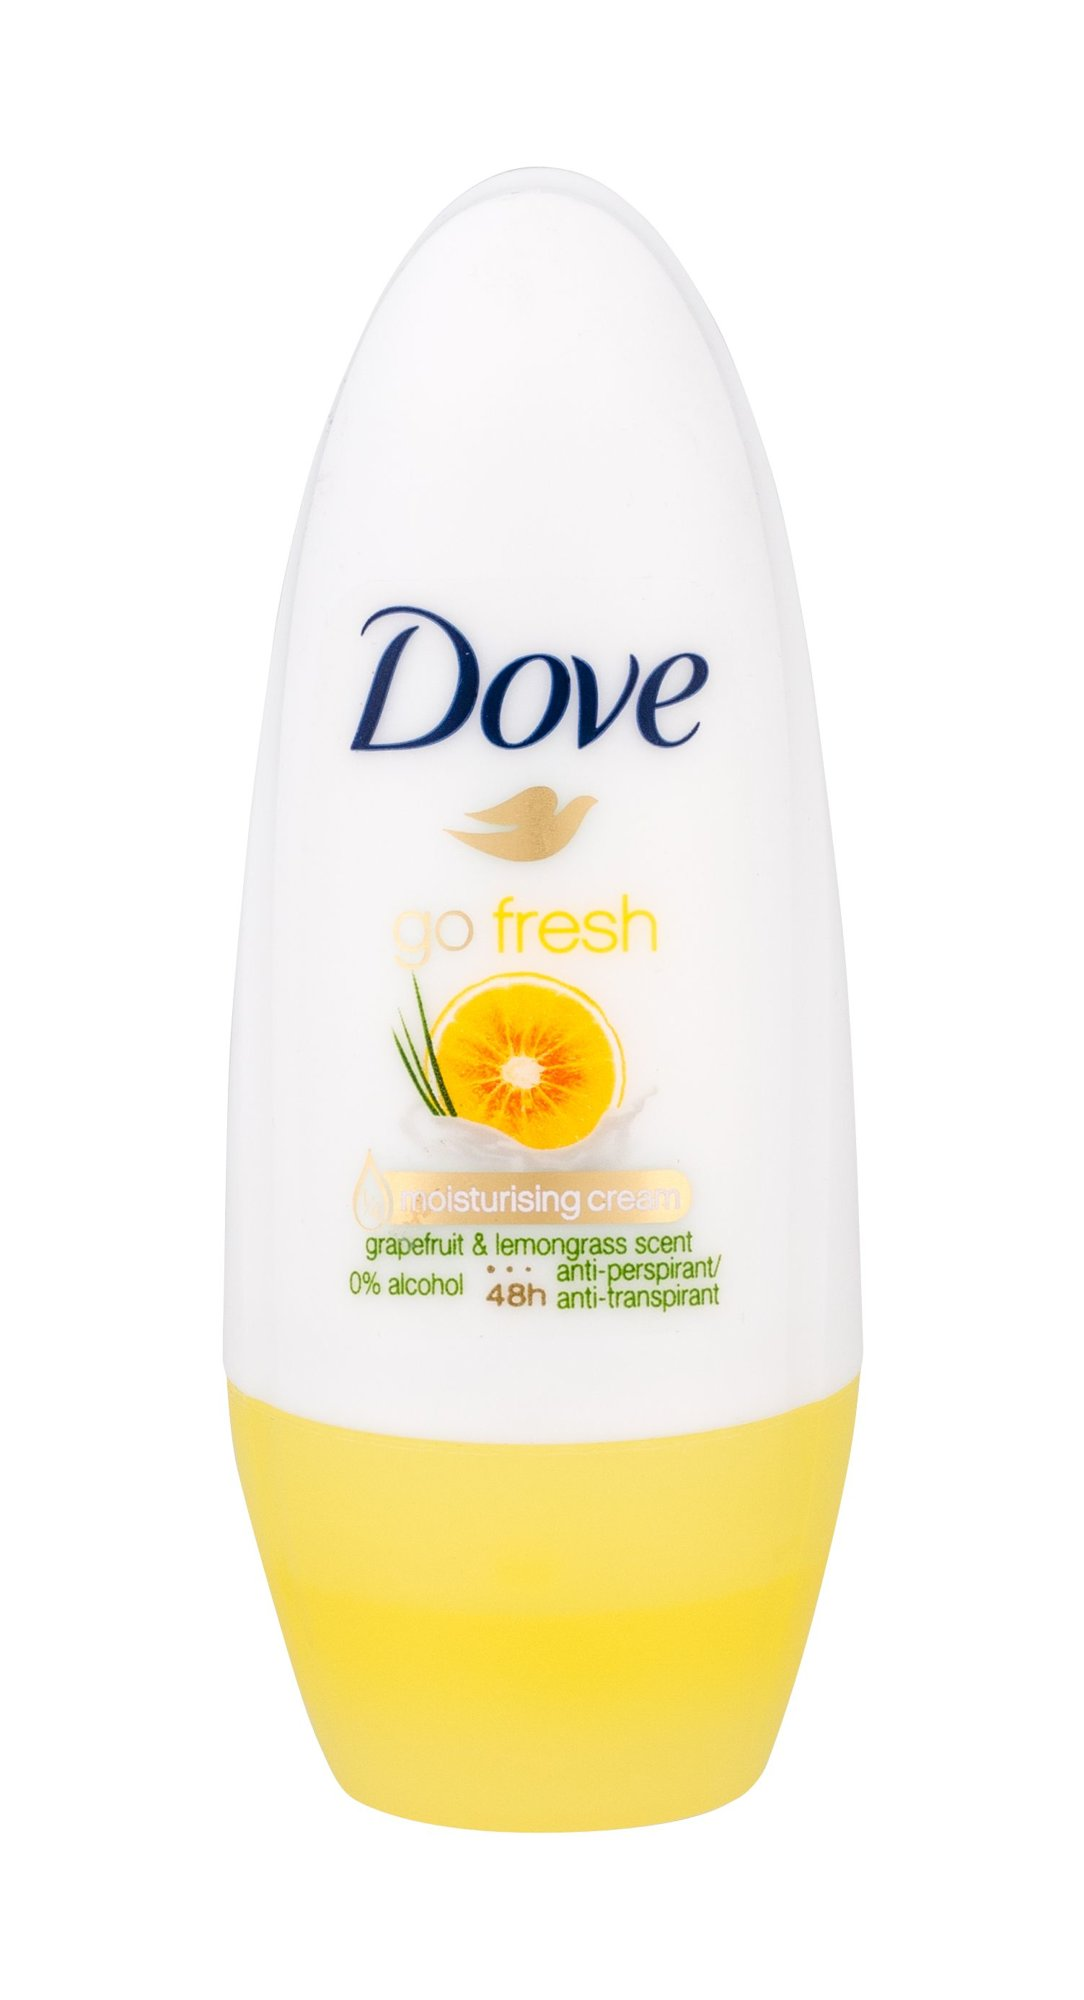 Dove Go Fresh Cosmetic 50ml